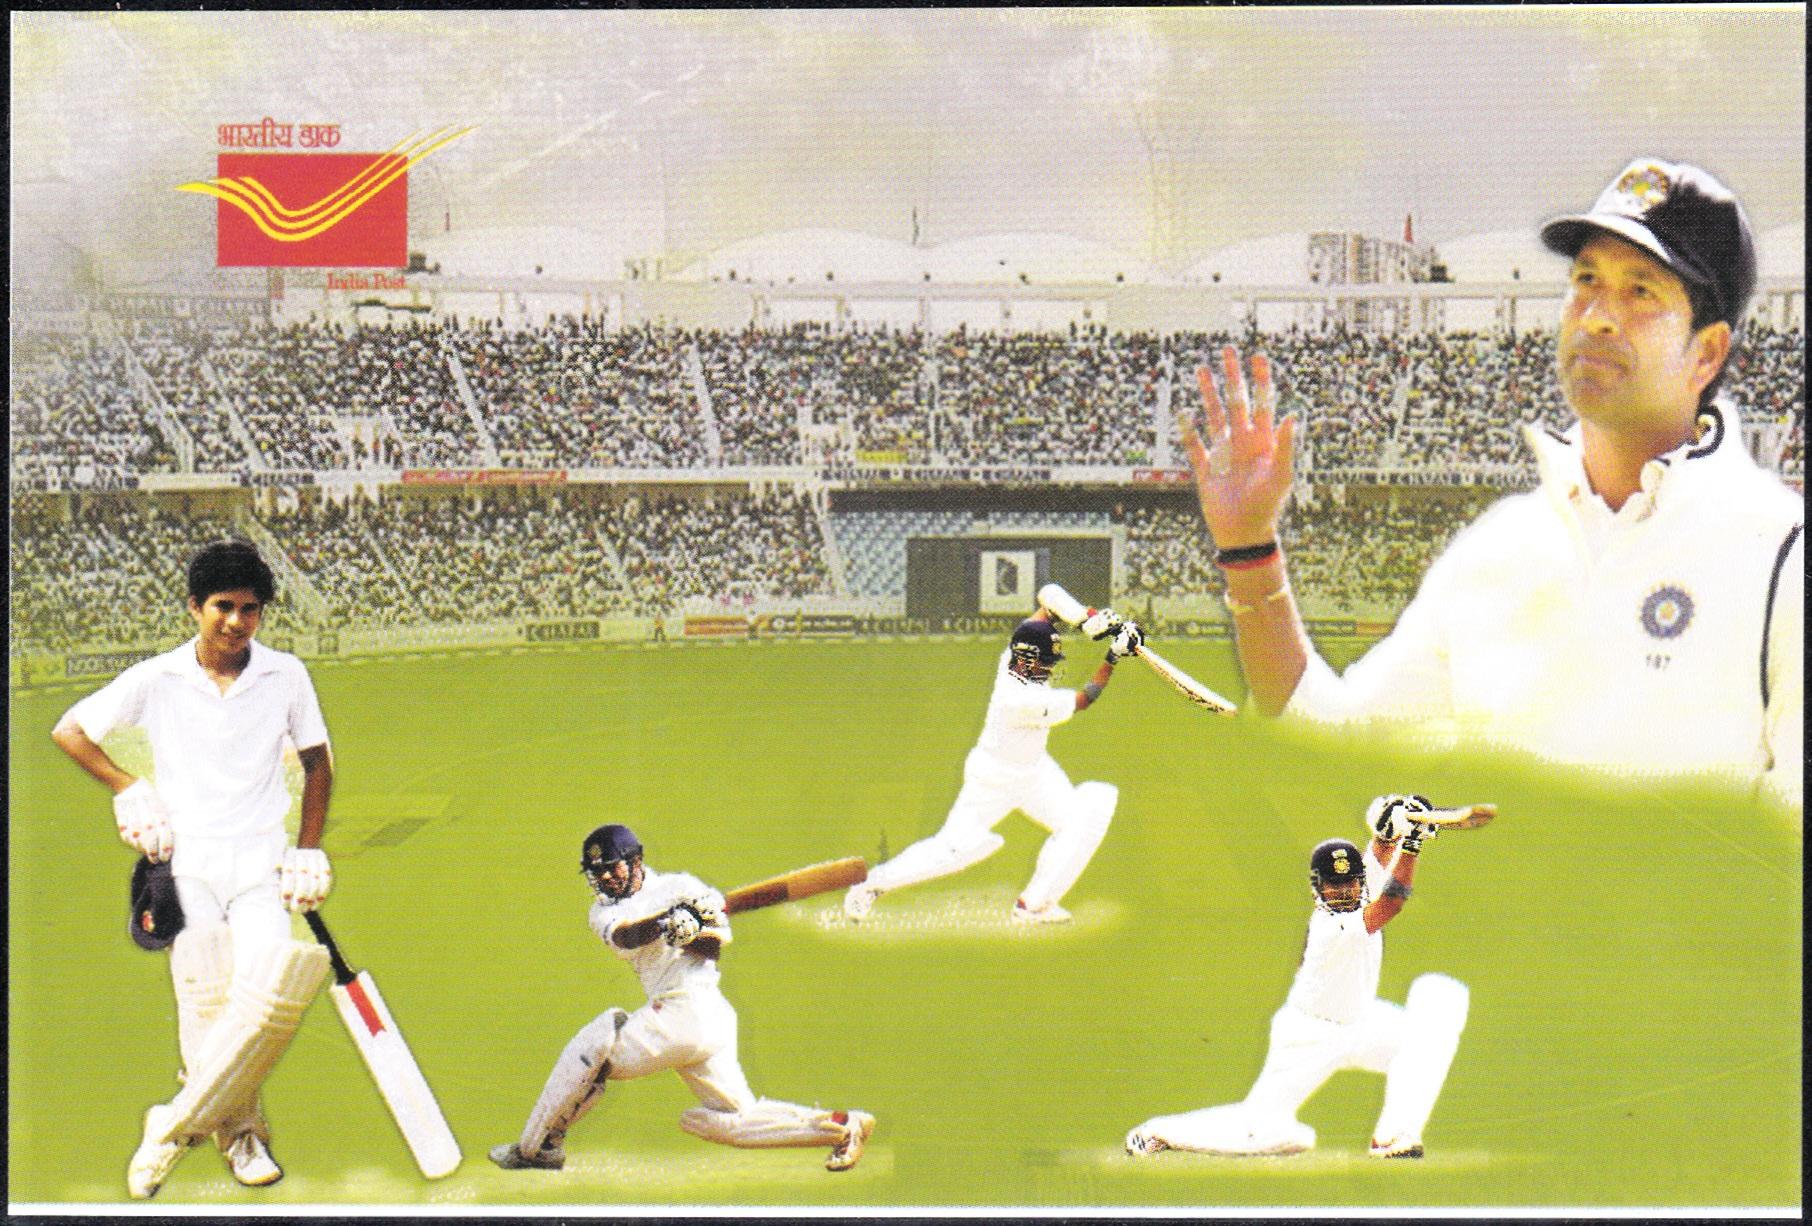 Sachin Playing different Cricket Shots